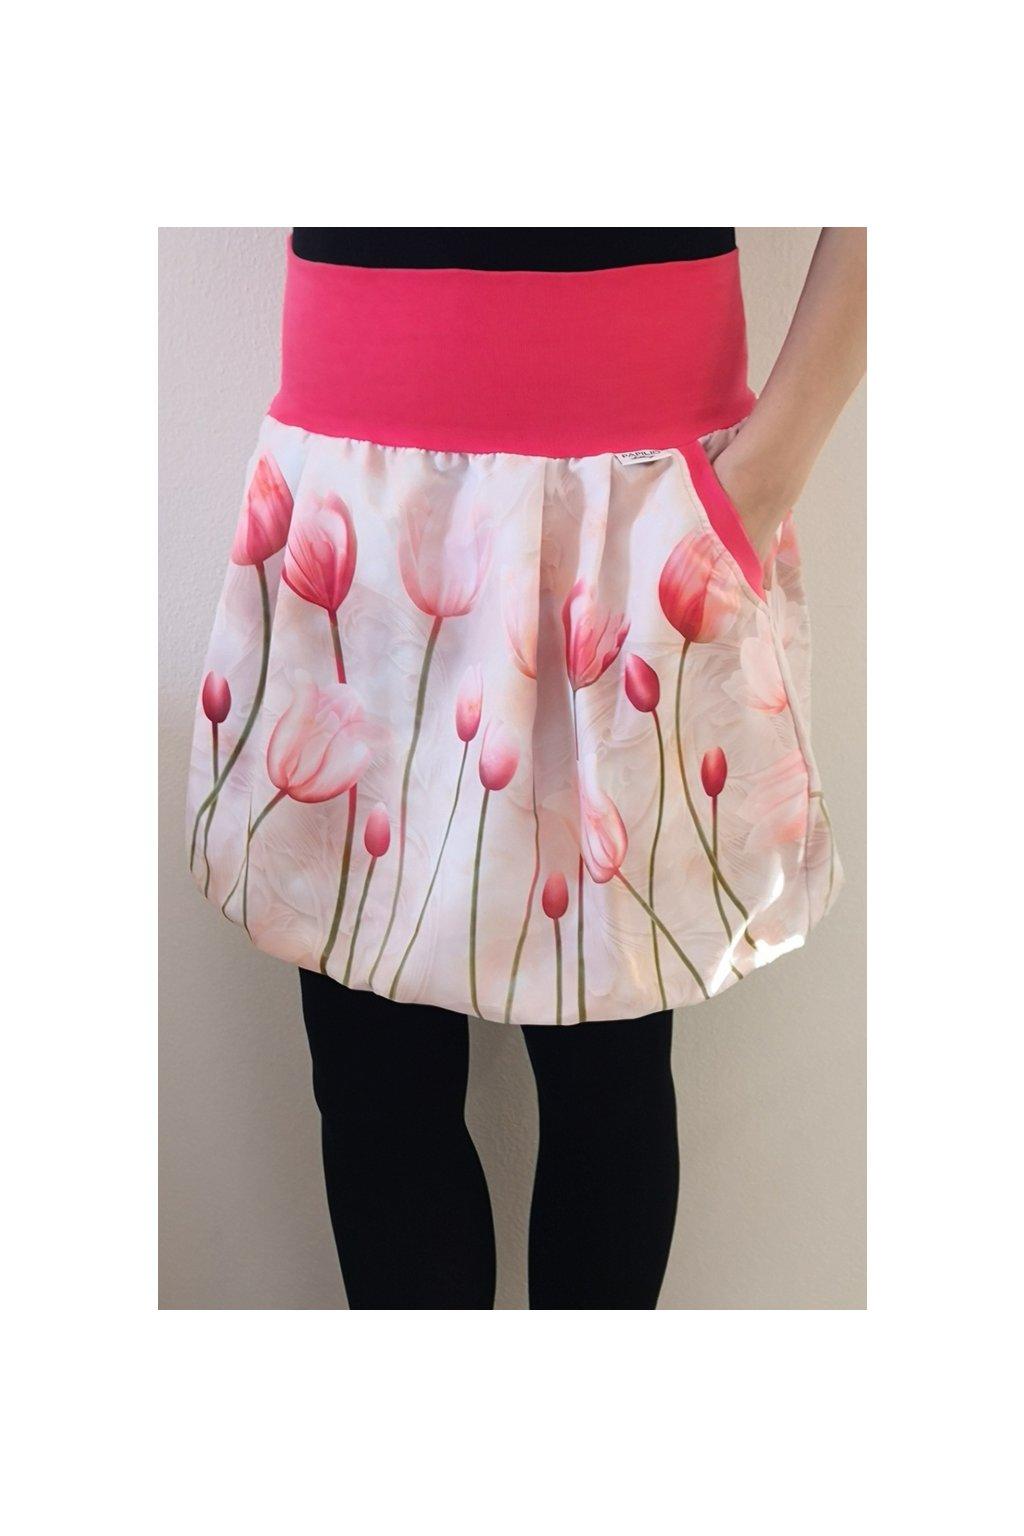 Něžné tulipány| micropeach